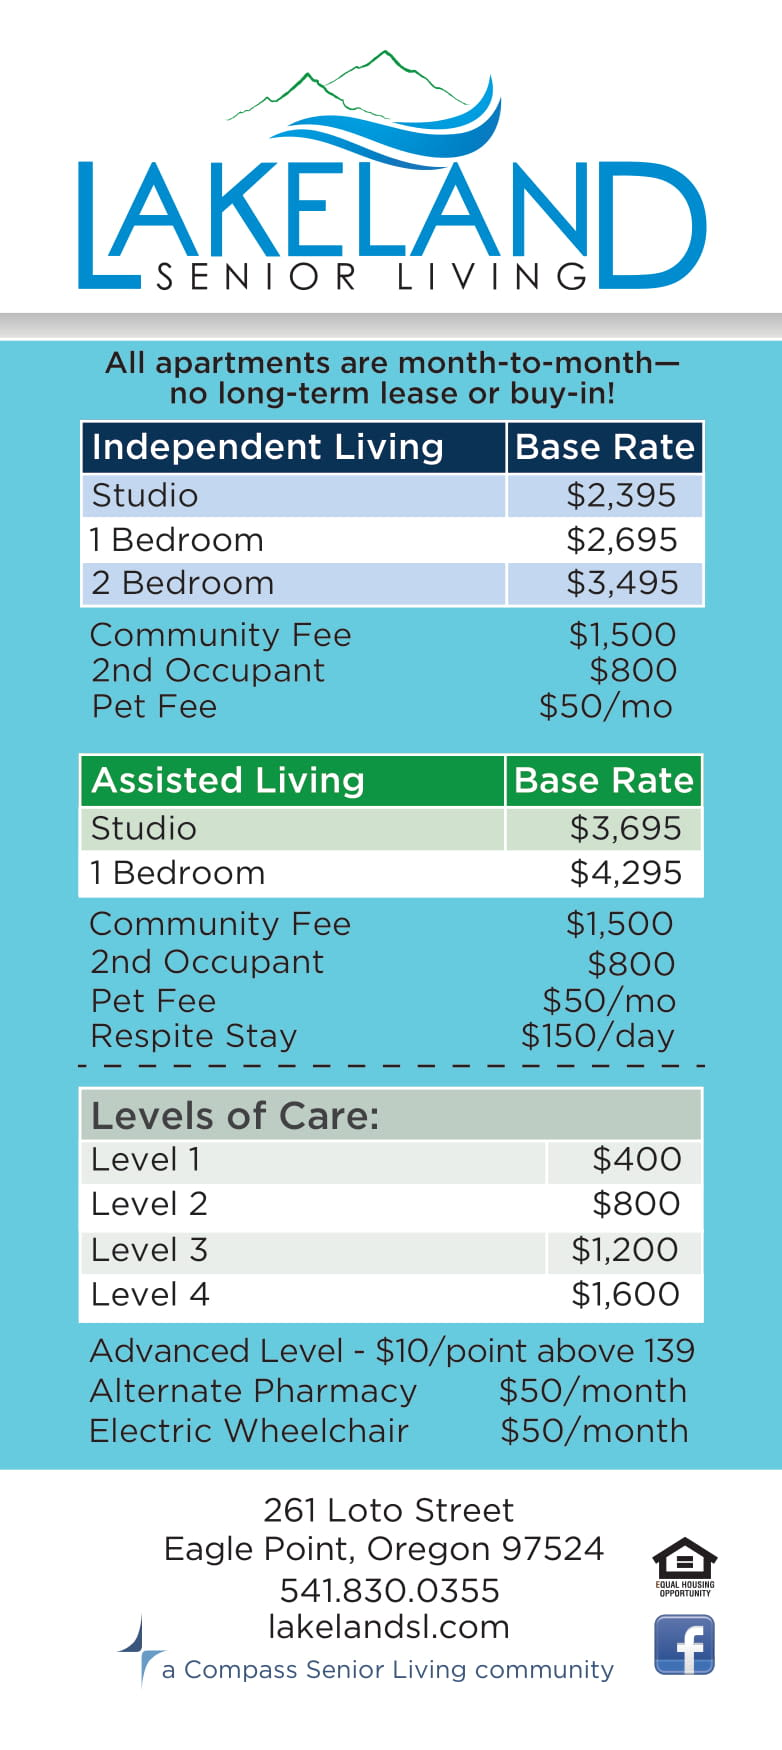 Lakeland Senior Living rates